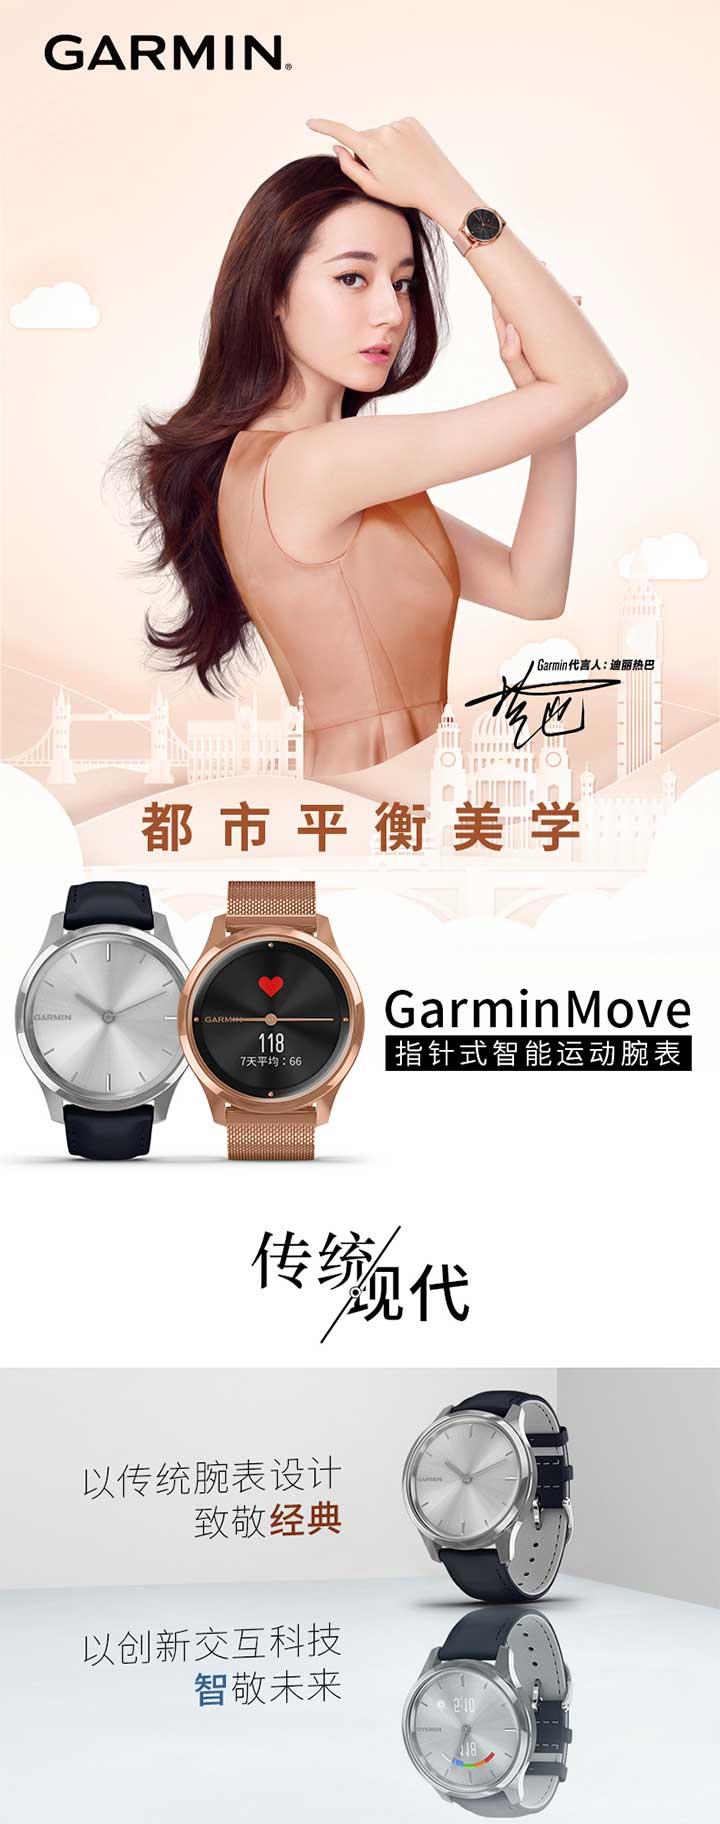 GarminMove智能运动腕表免费试用,评测